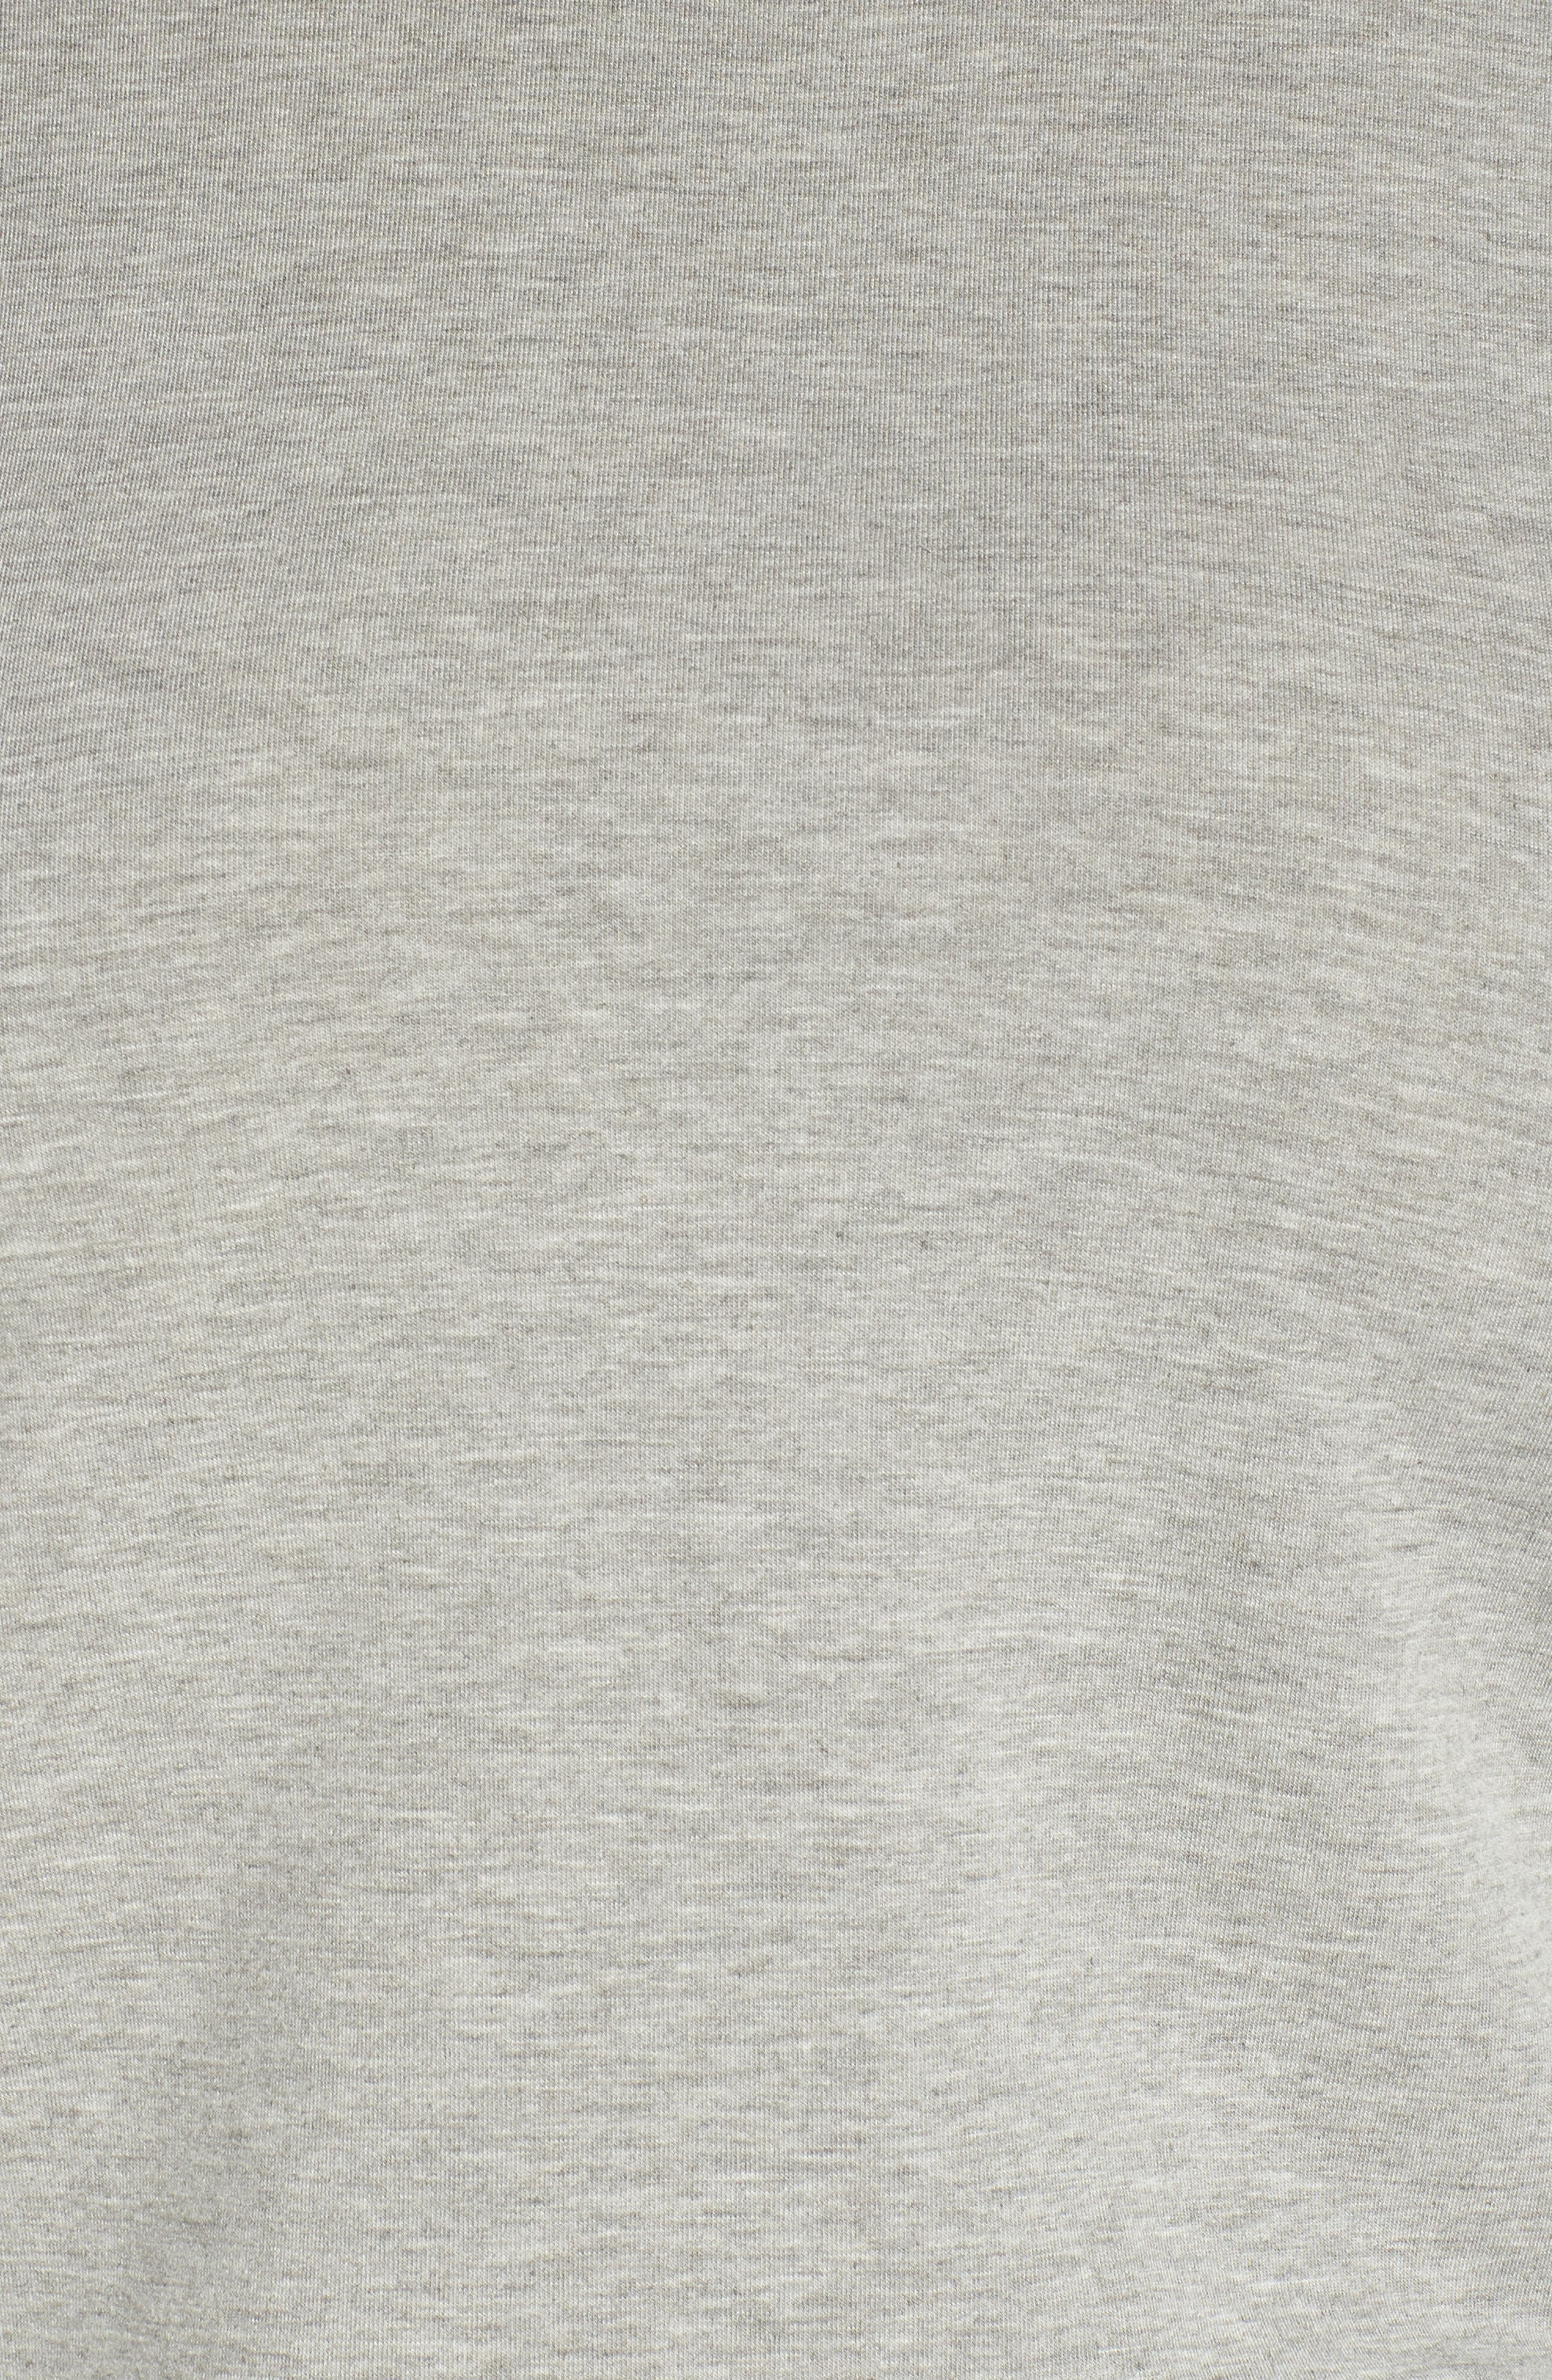 Off-Duty Hooded Sweatshirt,                             Alternate thumbnail 15, color,